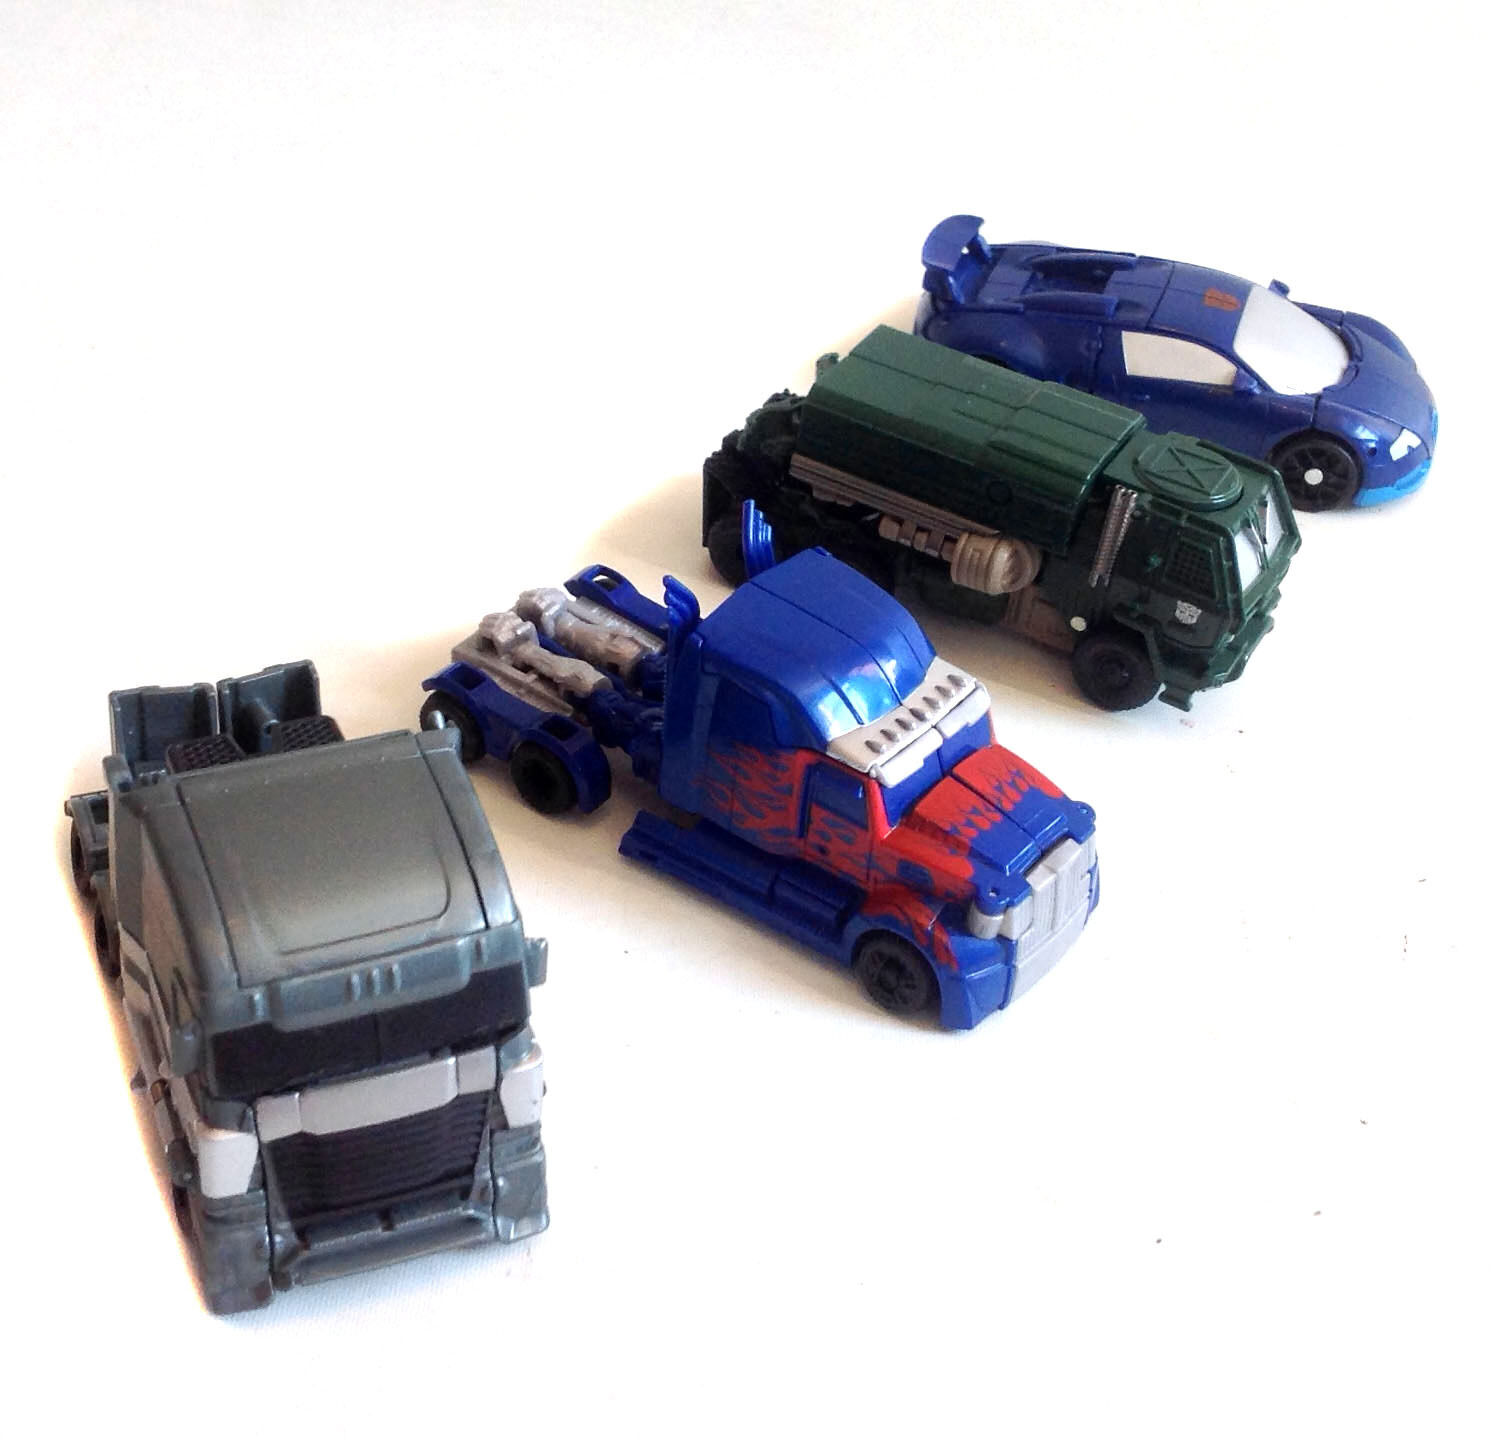 TRANSFORMERS Movie 4 5    Action figures  toy lot set with Prime + Megatron 3b21e3